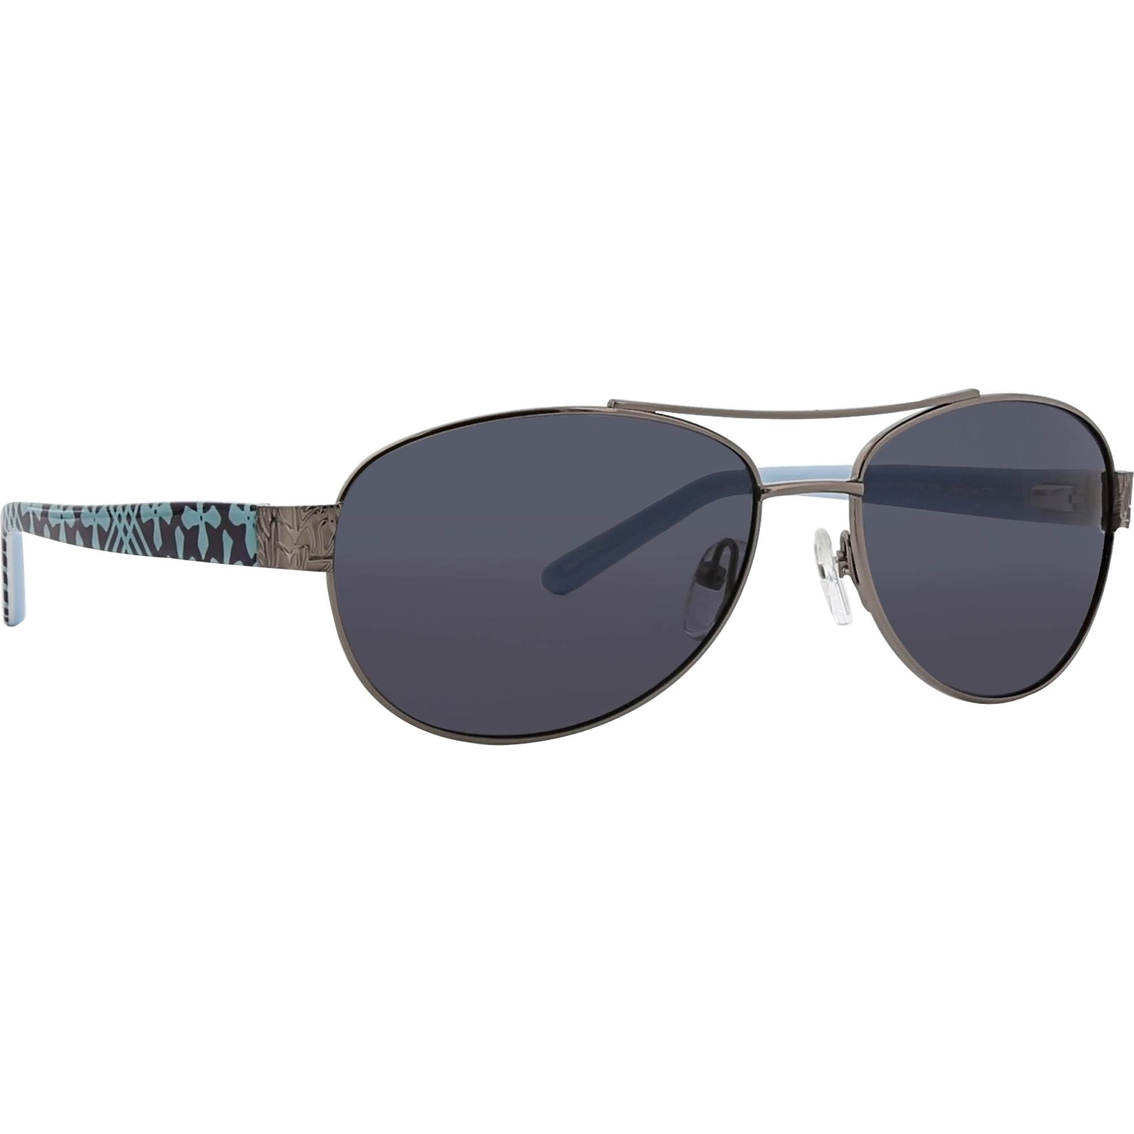 f8fb2dde3 Vera Bradley Marlene Metal and Plastic Aviator Polarized ANSI Z80.3  Sunglasses